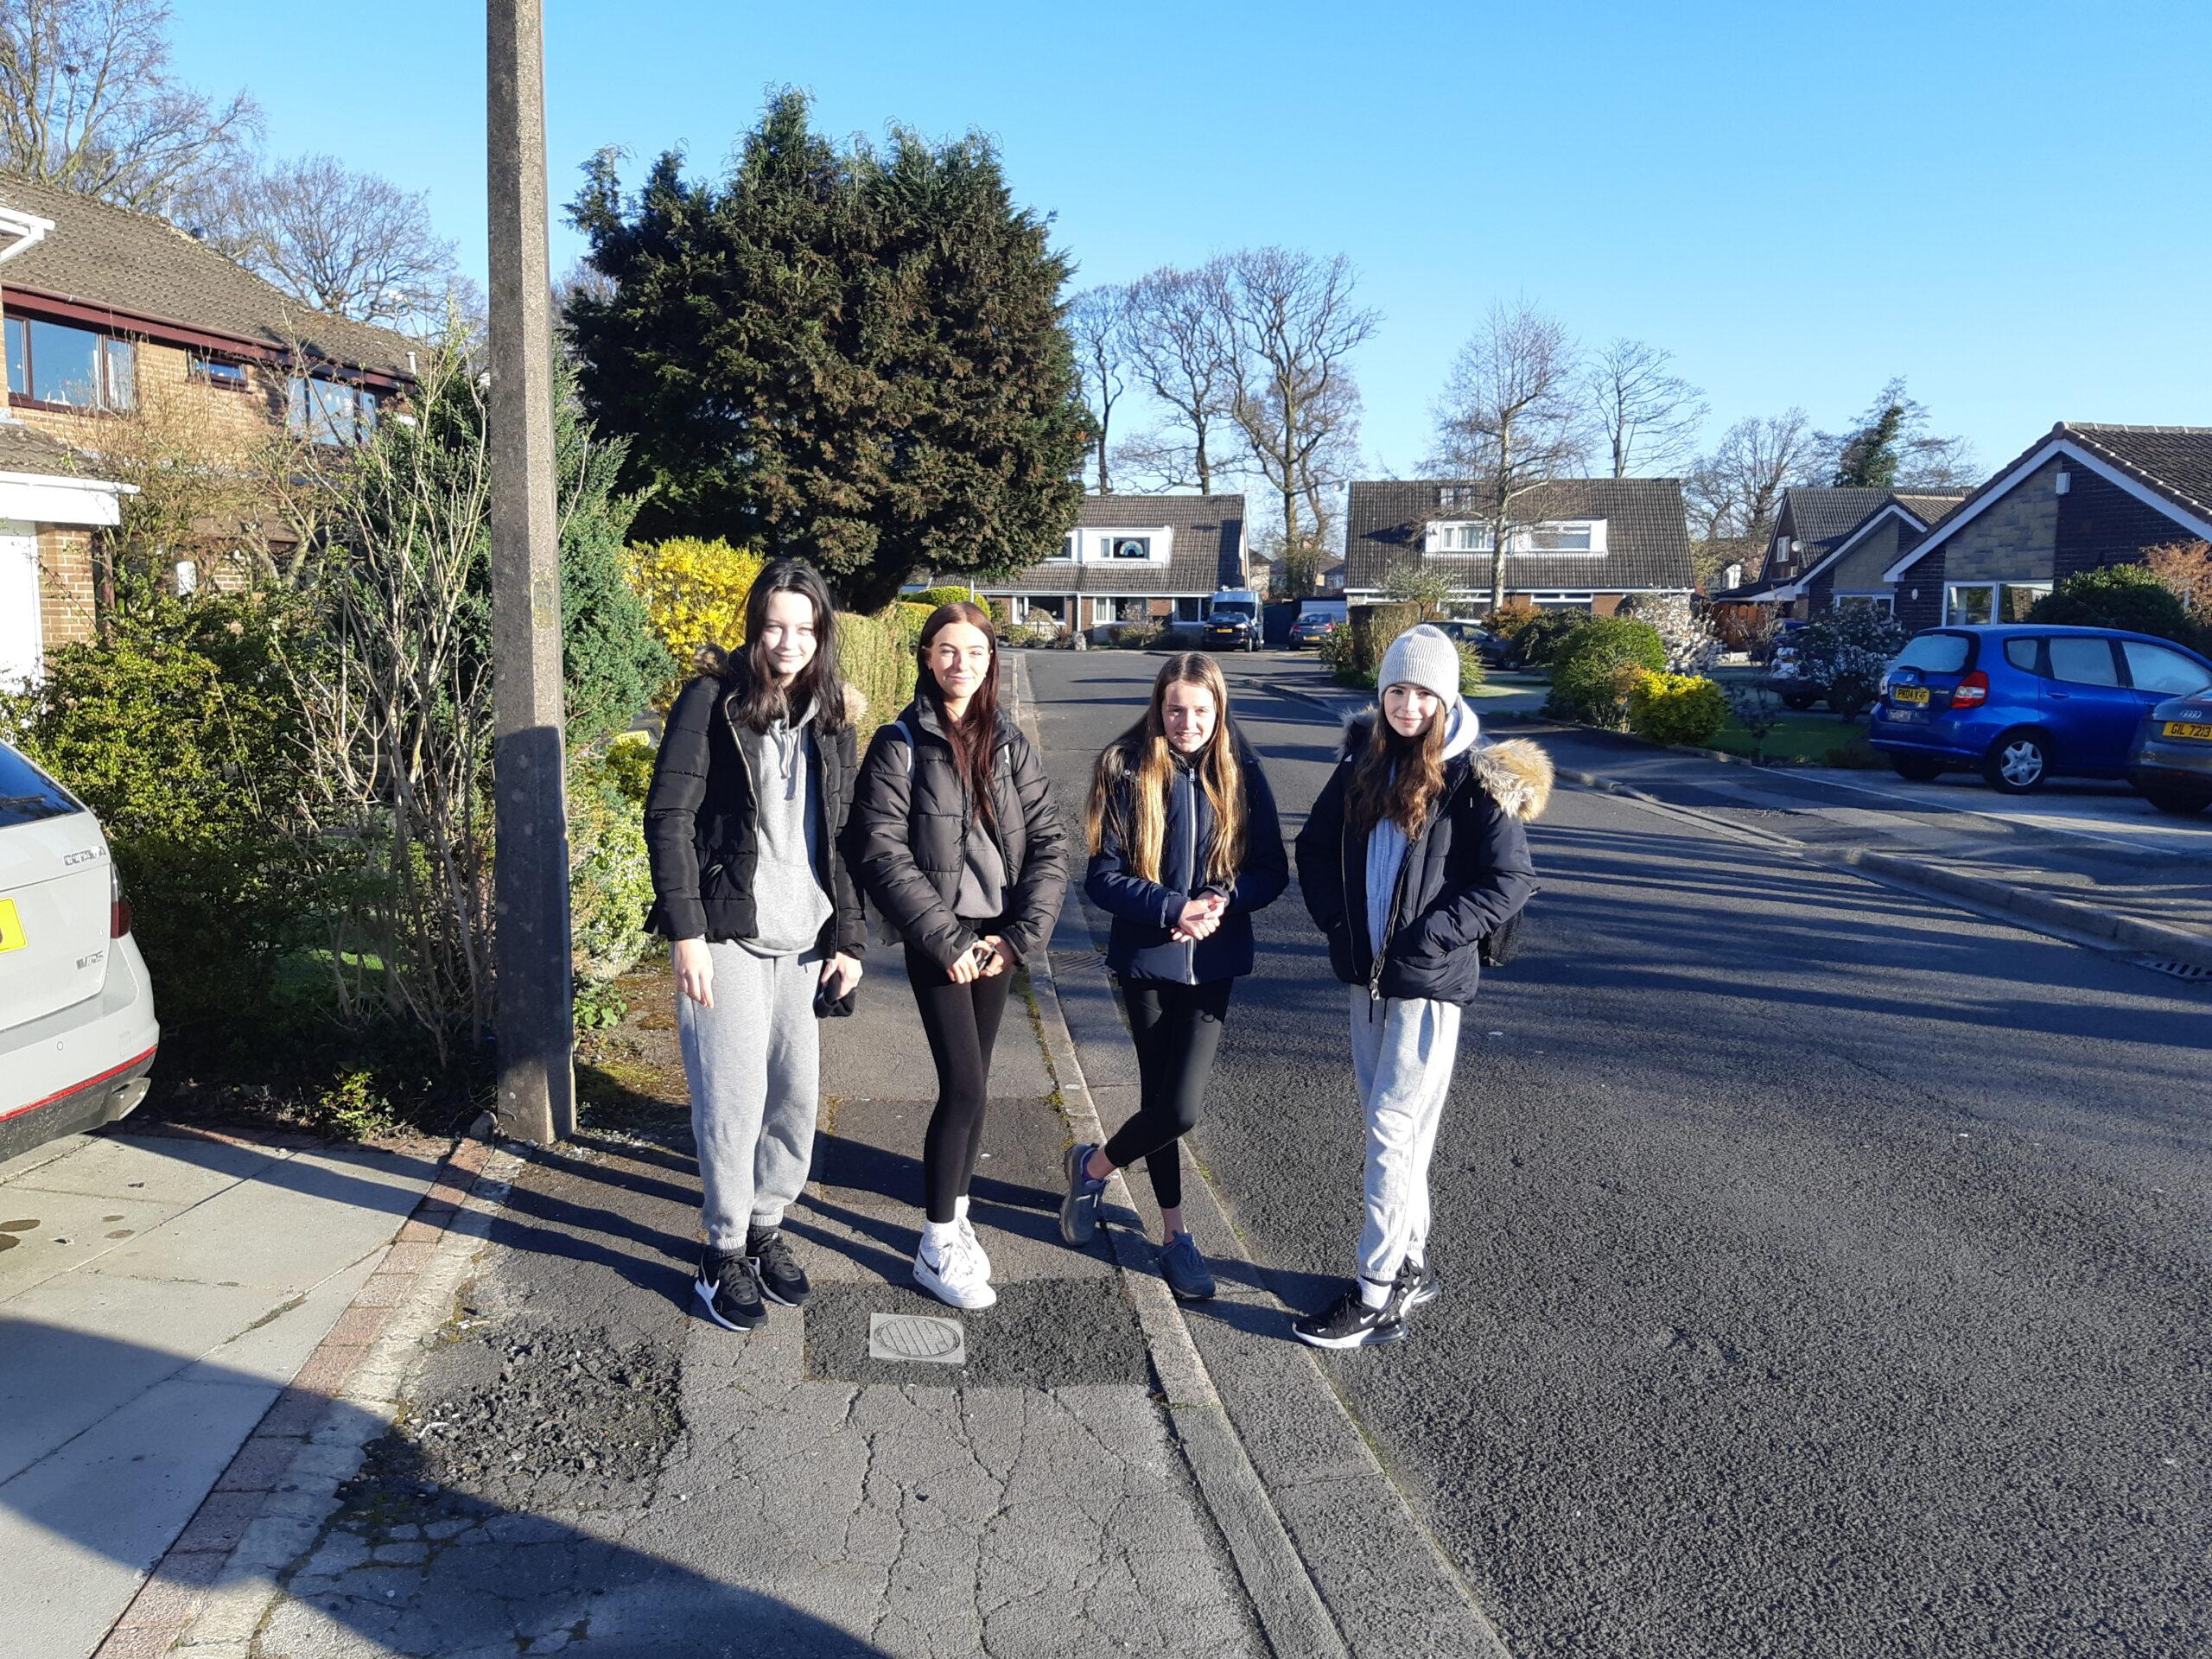 Ellie, Carla, Kiera and Laura